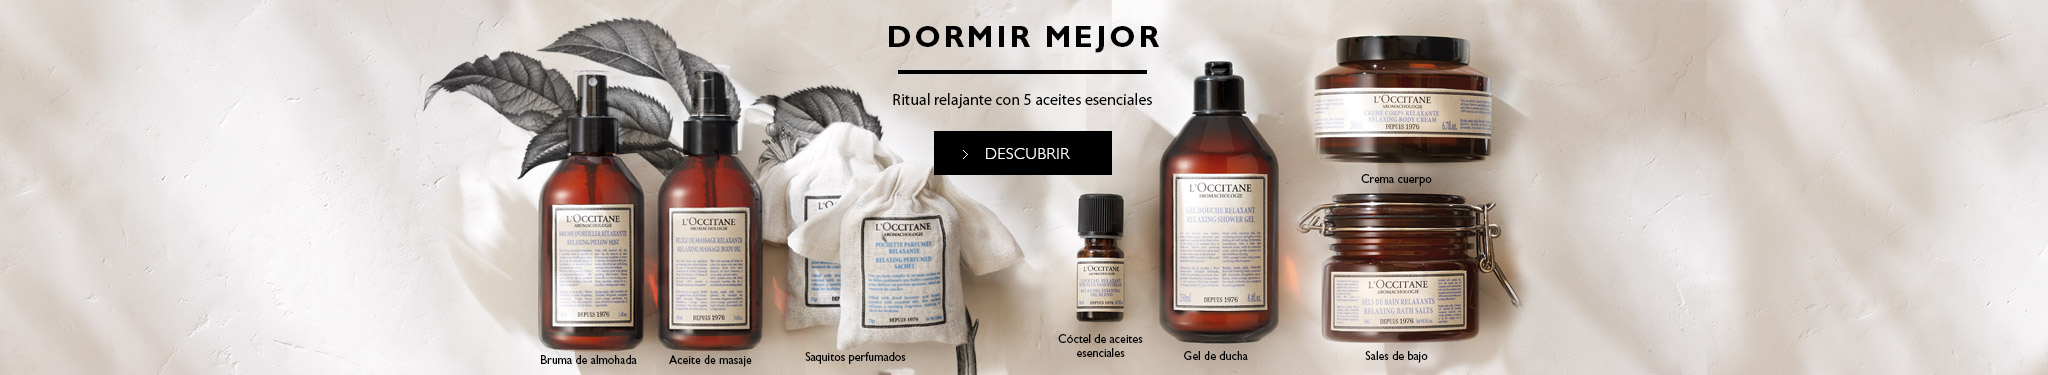 Aromacologia aceites escenciales - L'Occitane en provence